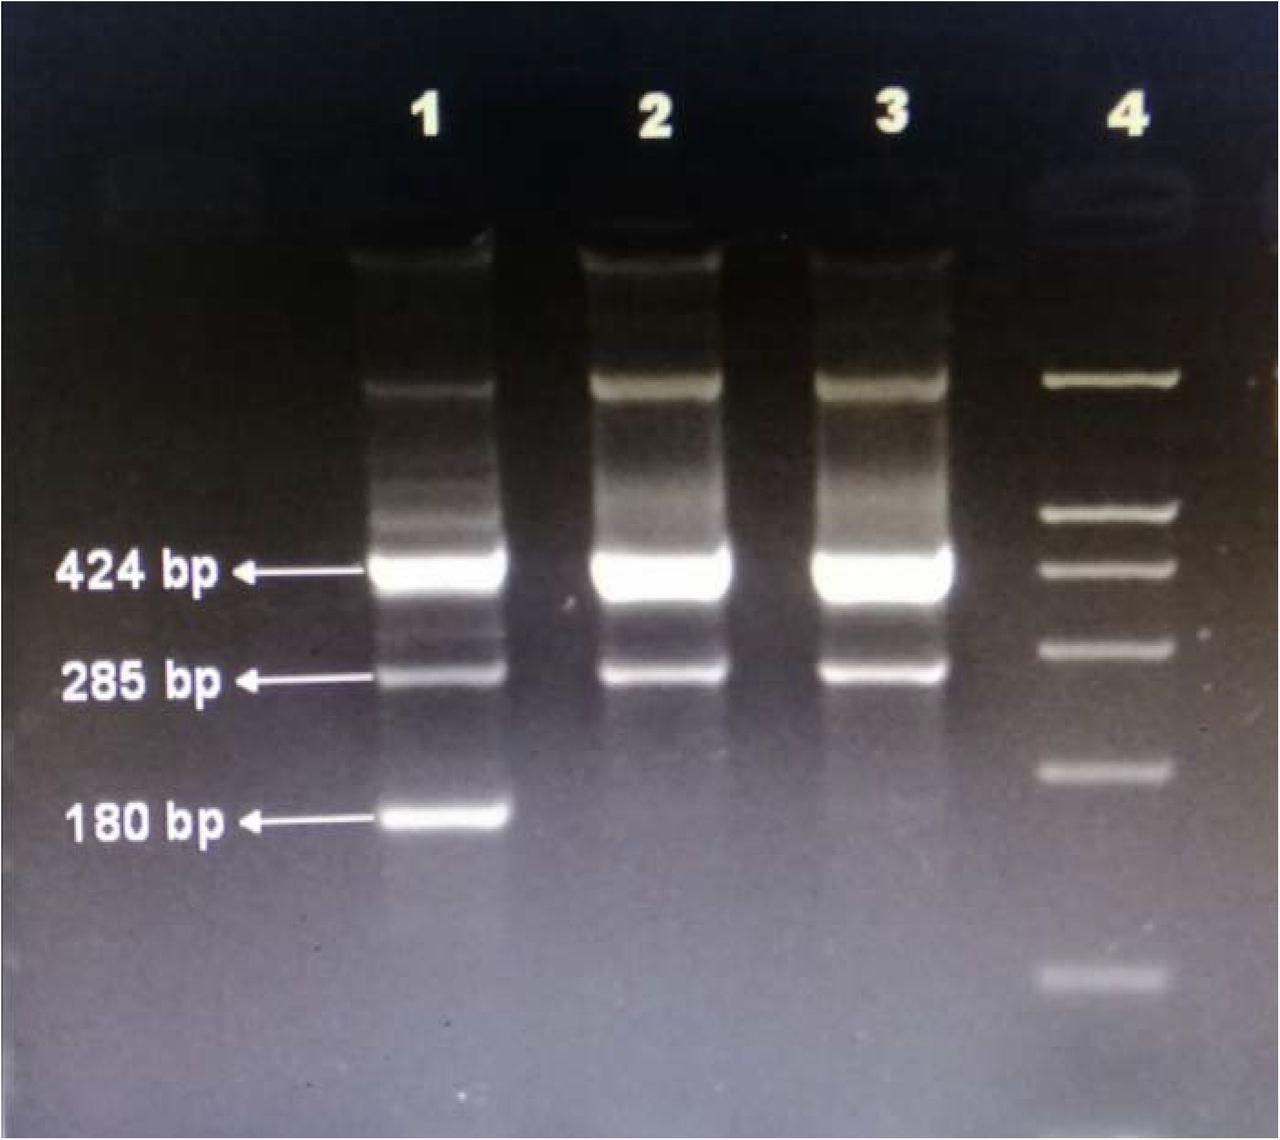 T-ARMS- PCR based genotyping of the ITGB3 gene (Lane 1 heterozygous; lane 2,3 normal and lane 4 DNA ladder)